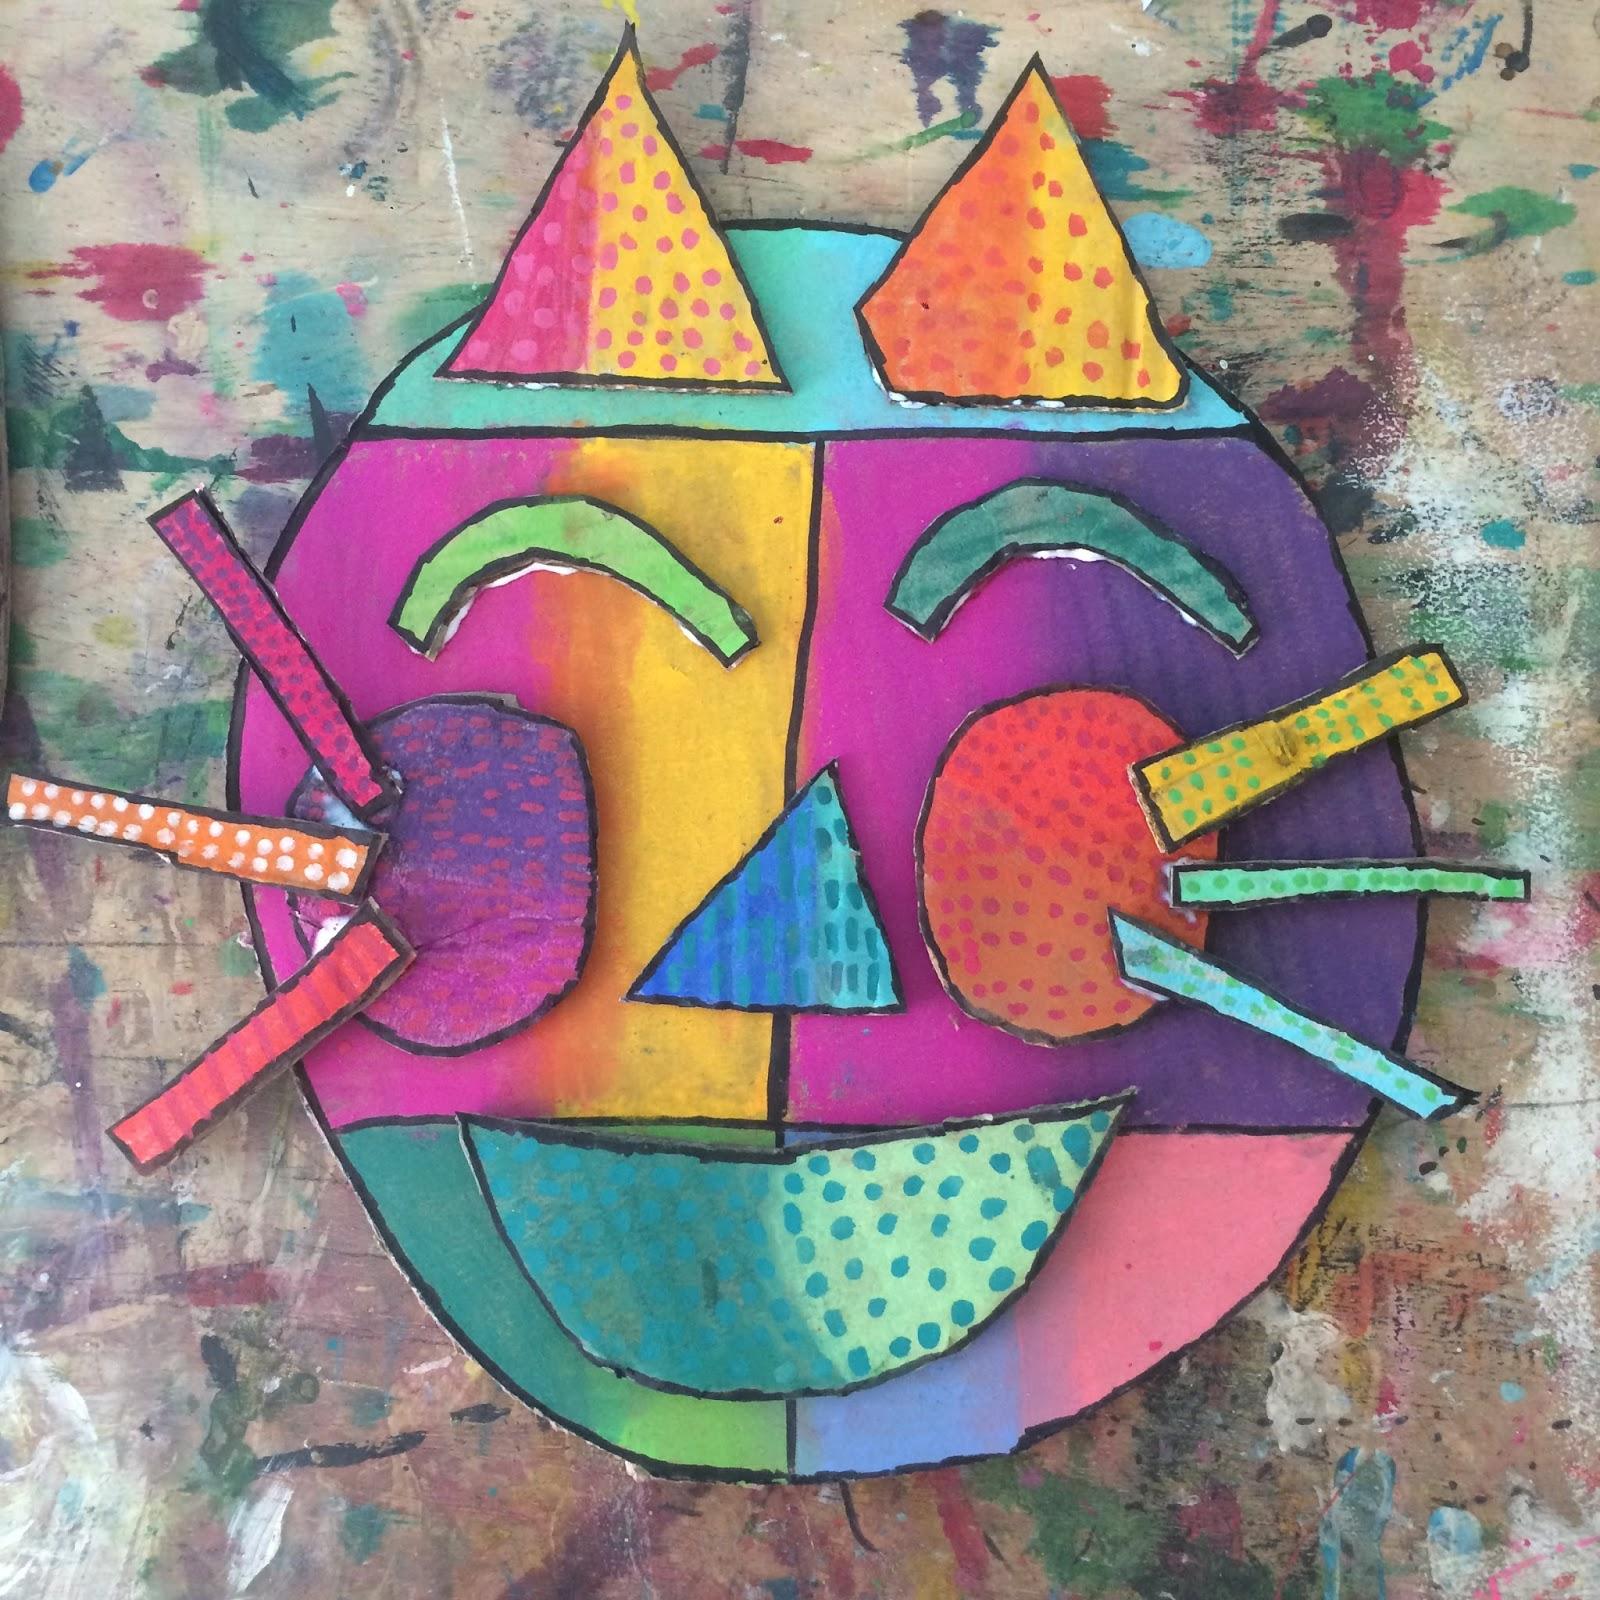 Zimmerwand graffiti miriam glotzschulz glotzschulz on pinterest